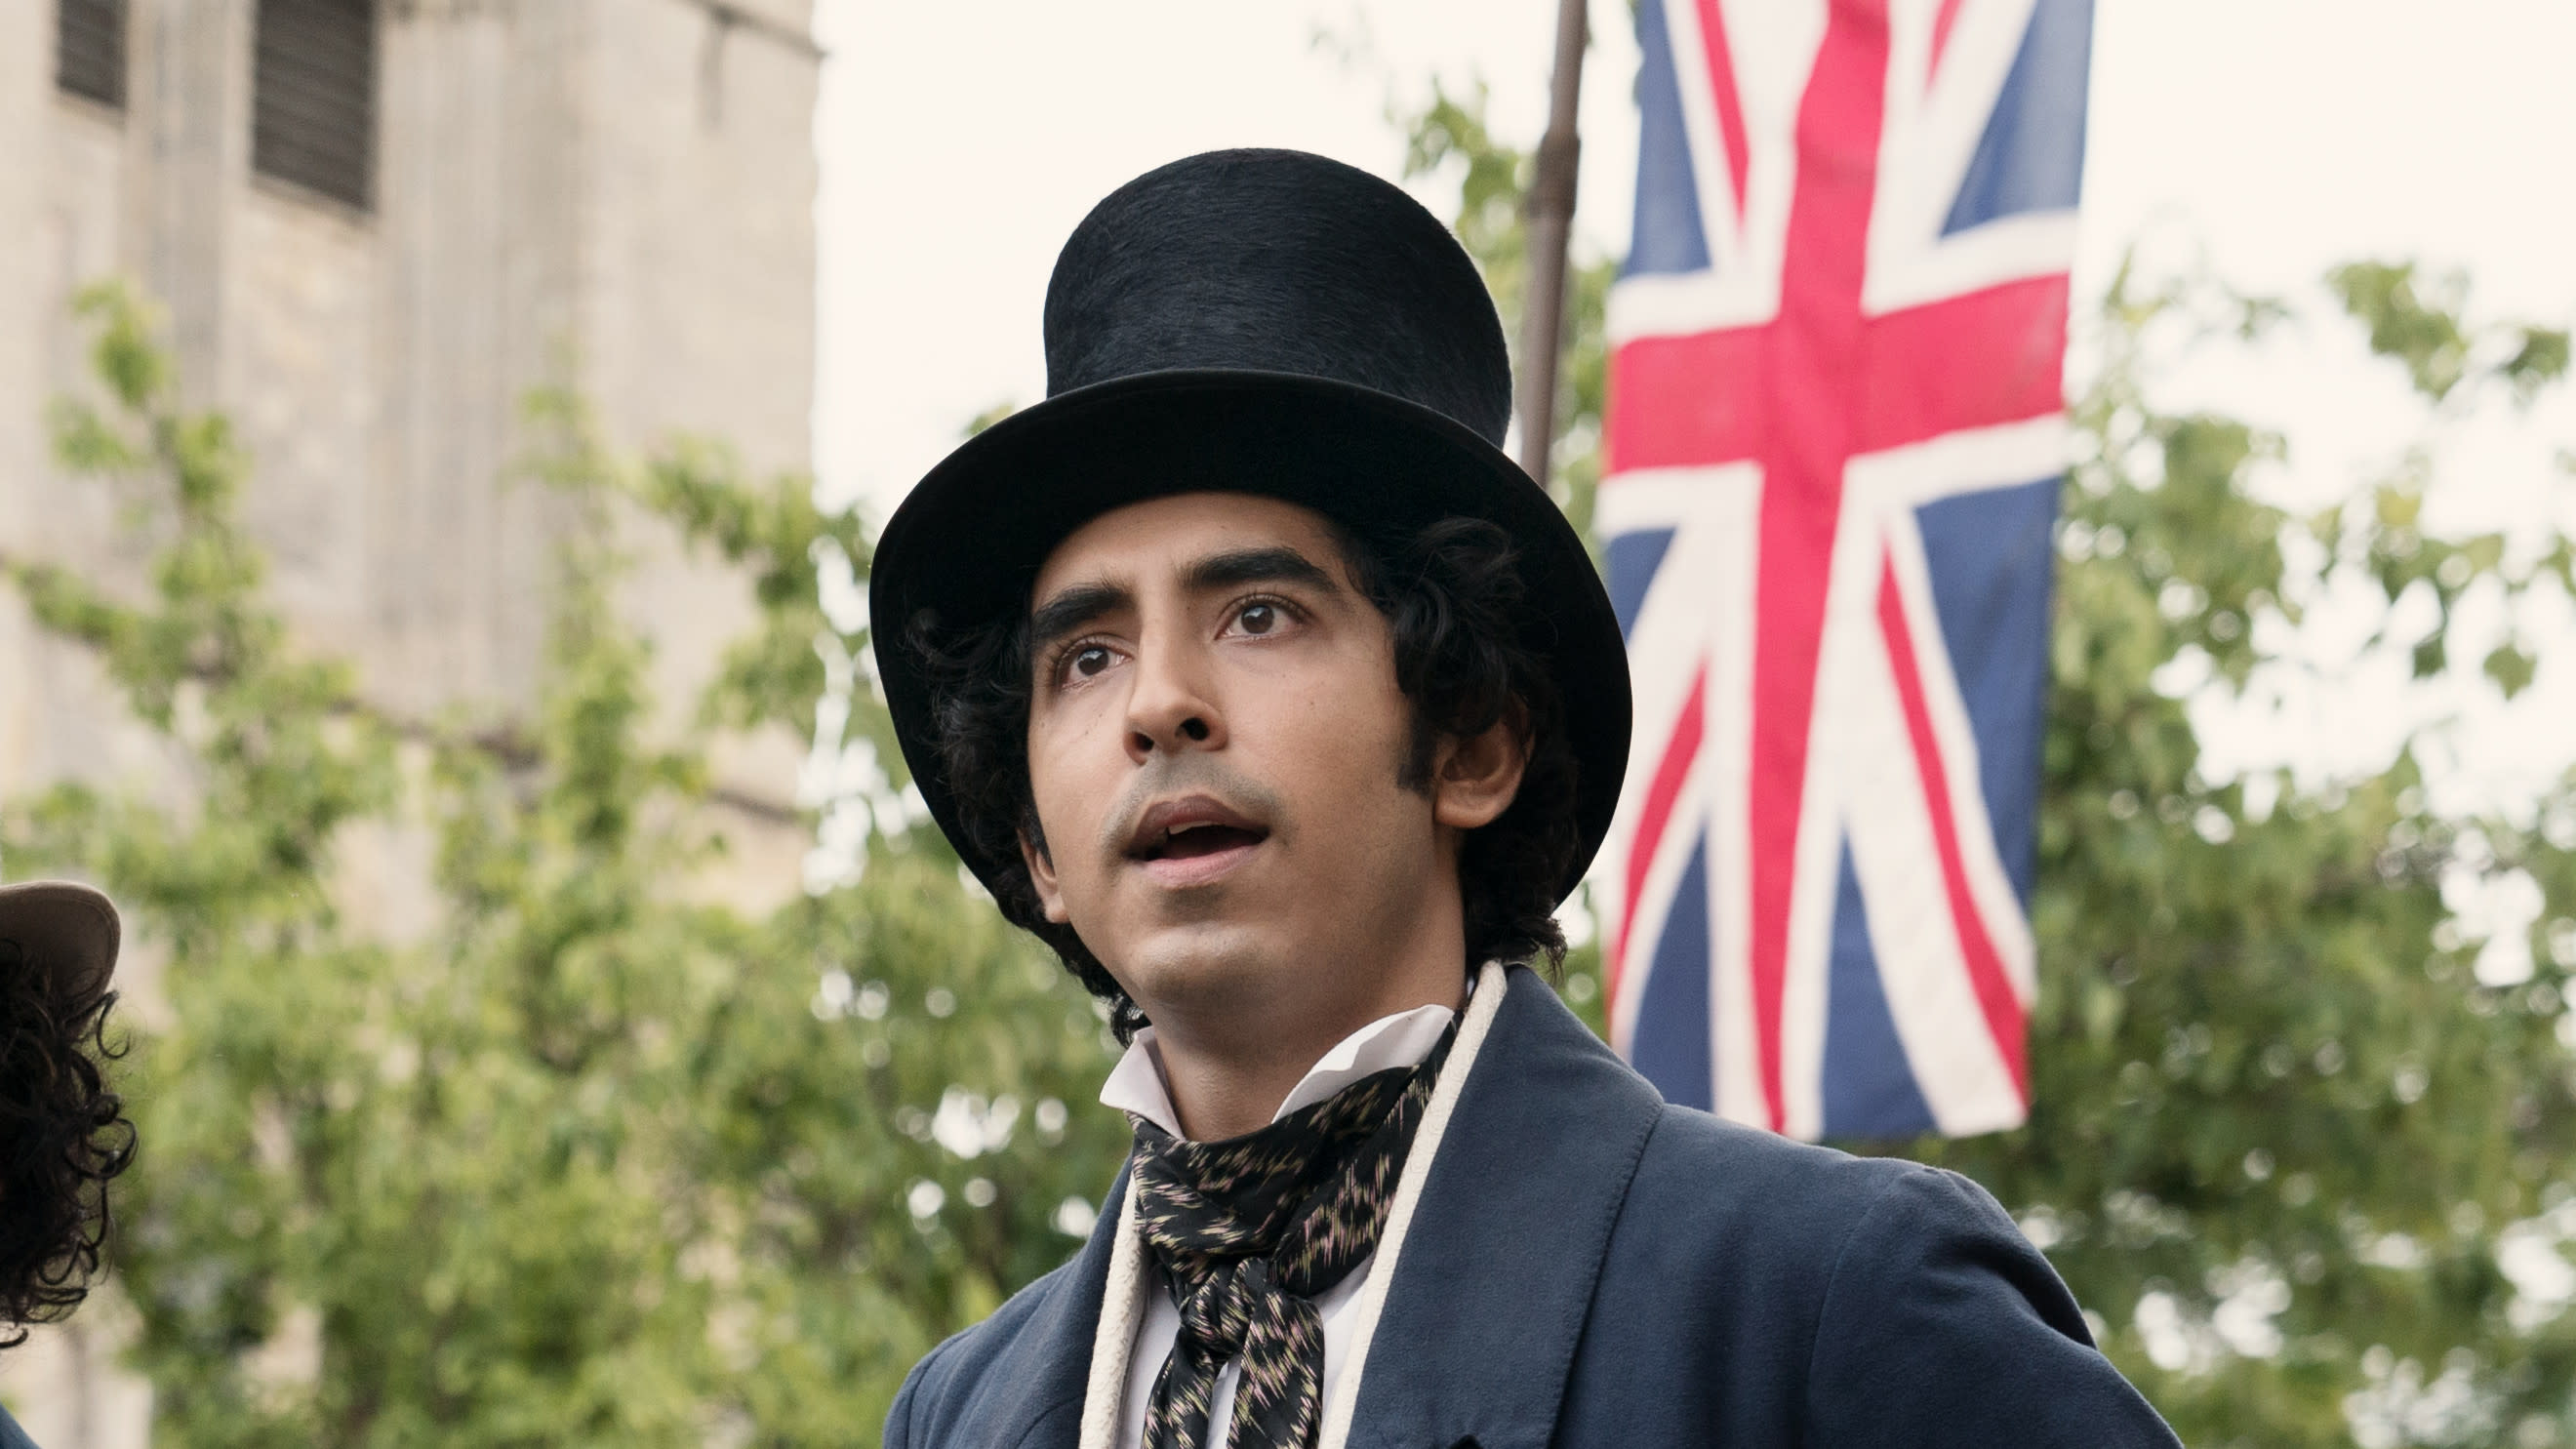 Dev Patel praises 'brave' colourblind casting in 'David Copperfield' film (exclusive)